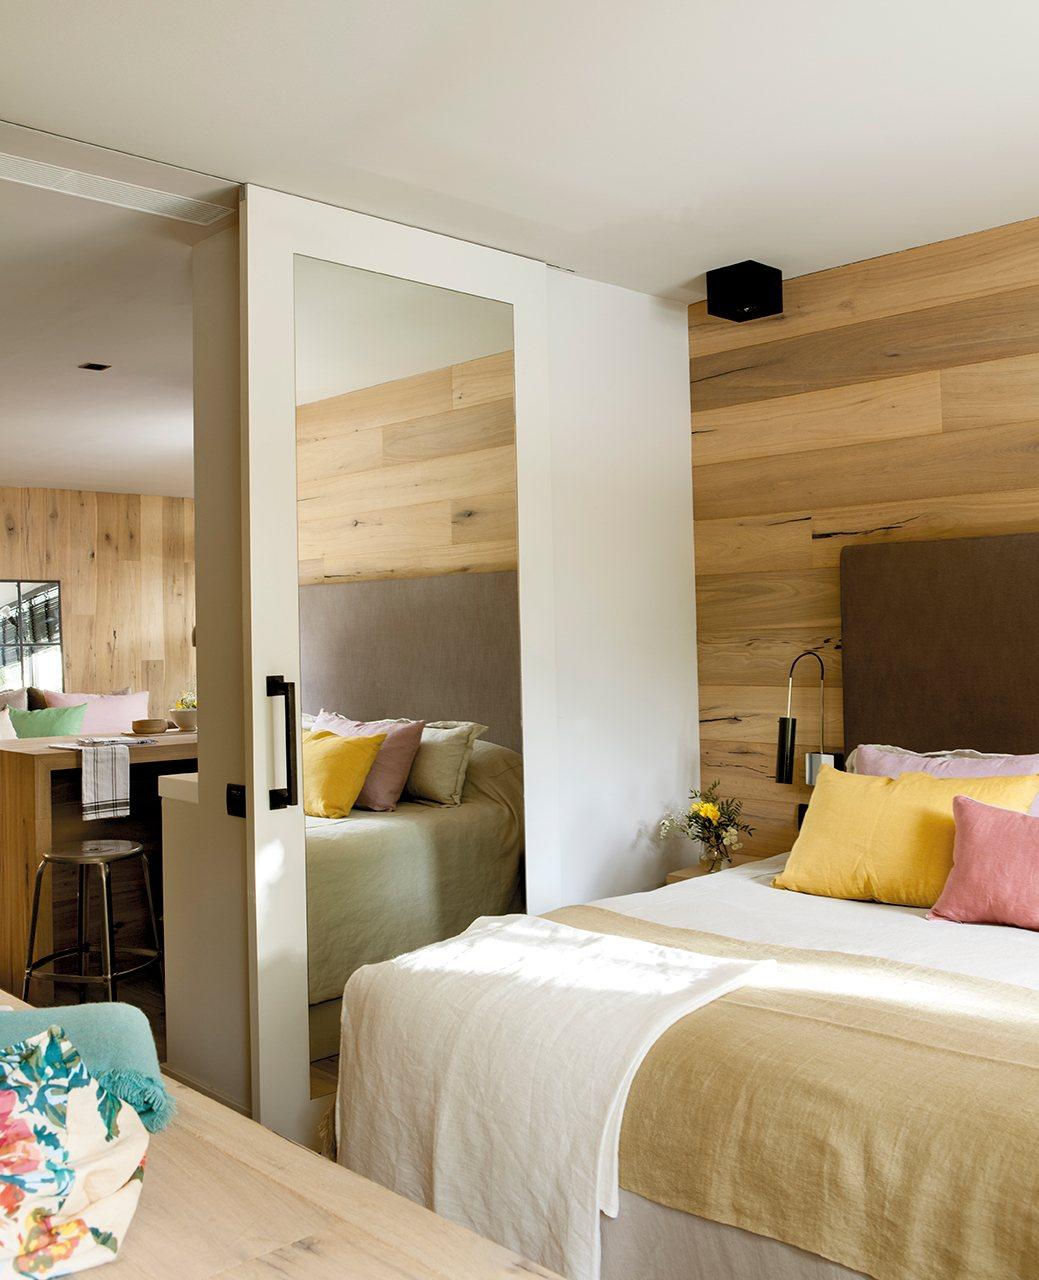 De vieja oficina a luminoso loft para dos - Ideas decoracion paredes dormitorios ...